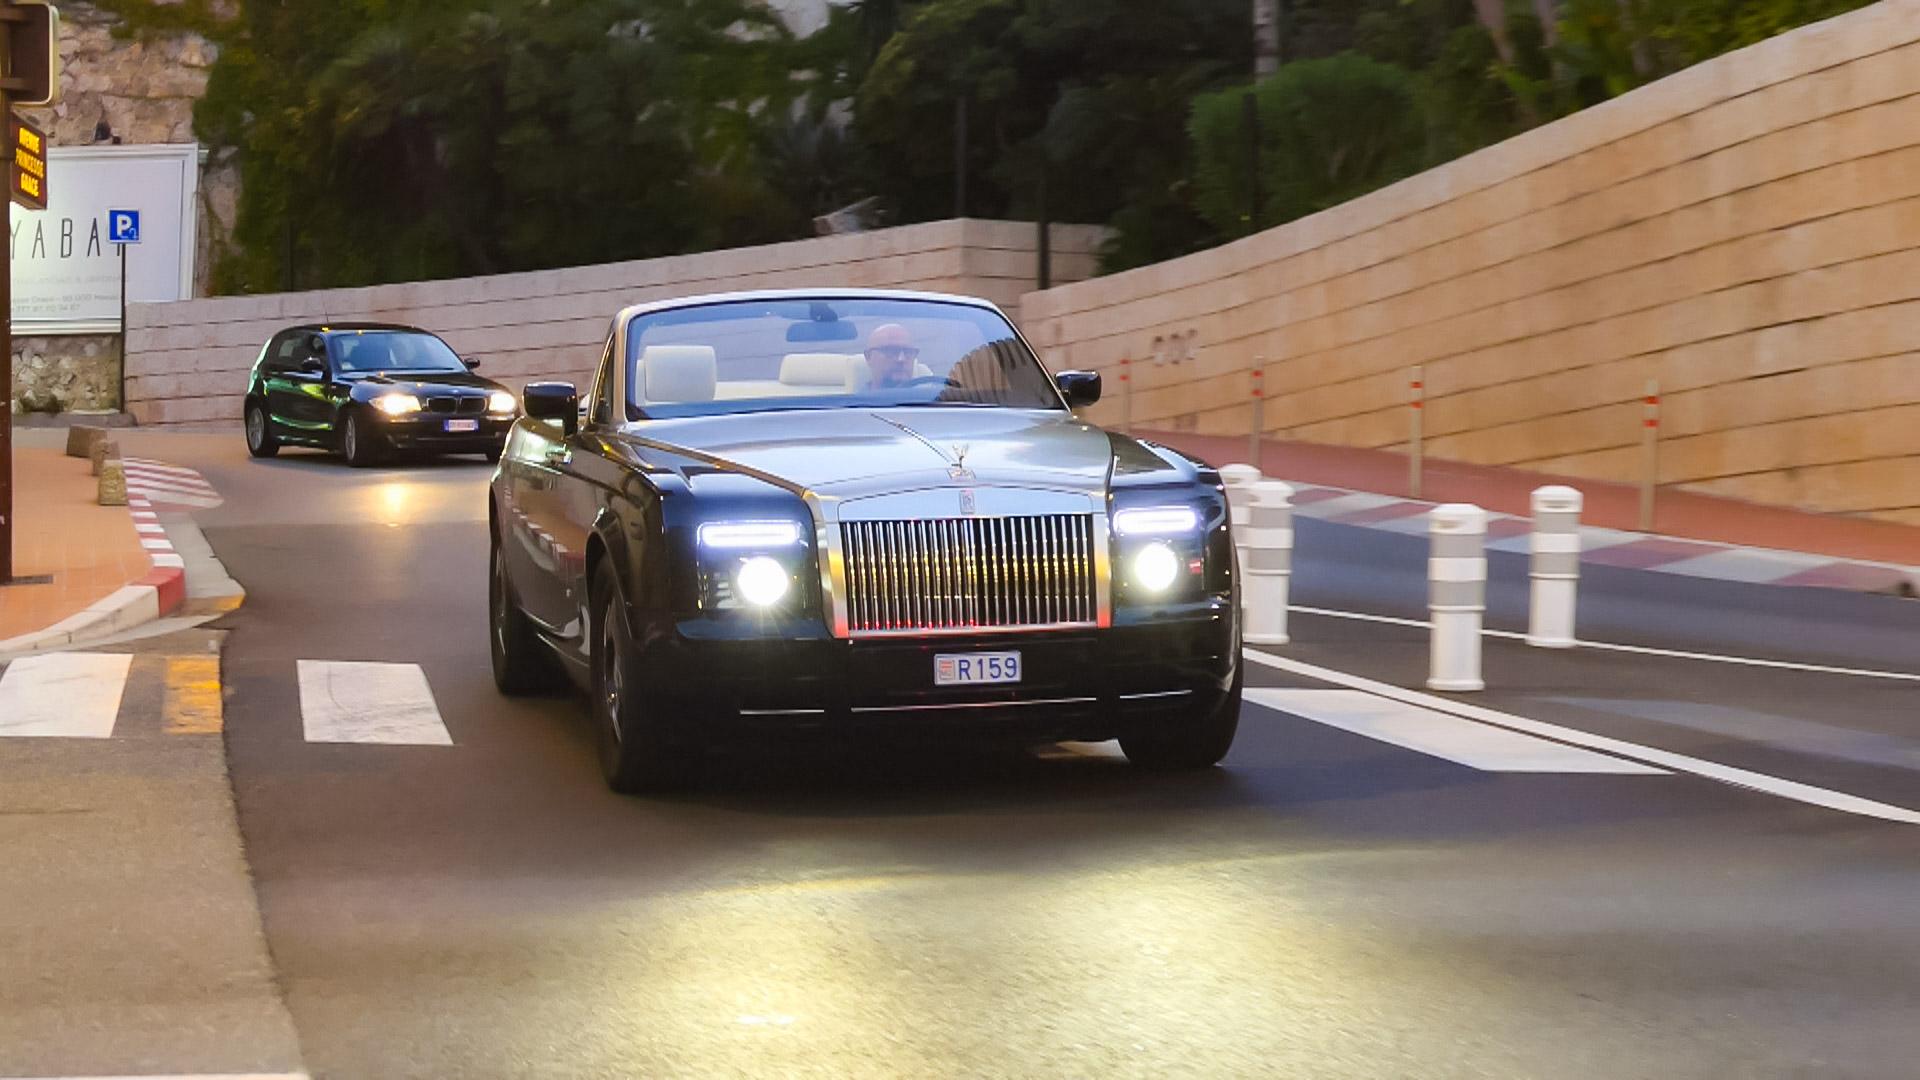 Rolls Royce Drophead - R159 (MC)